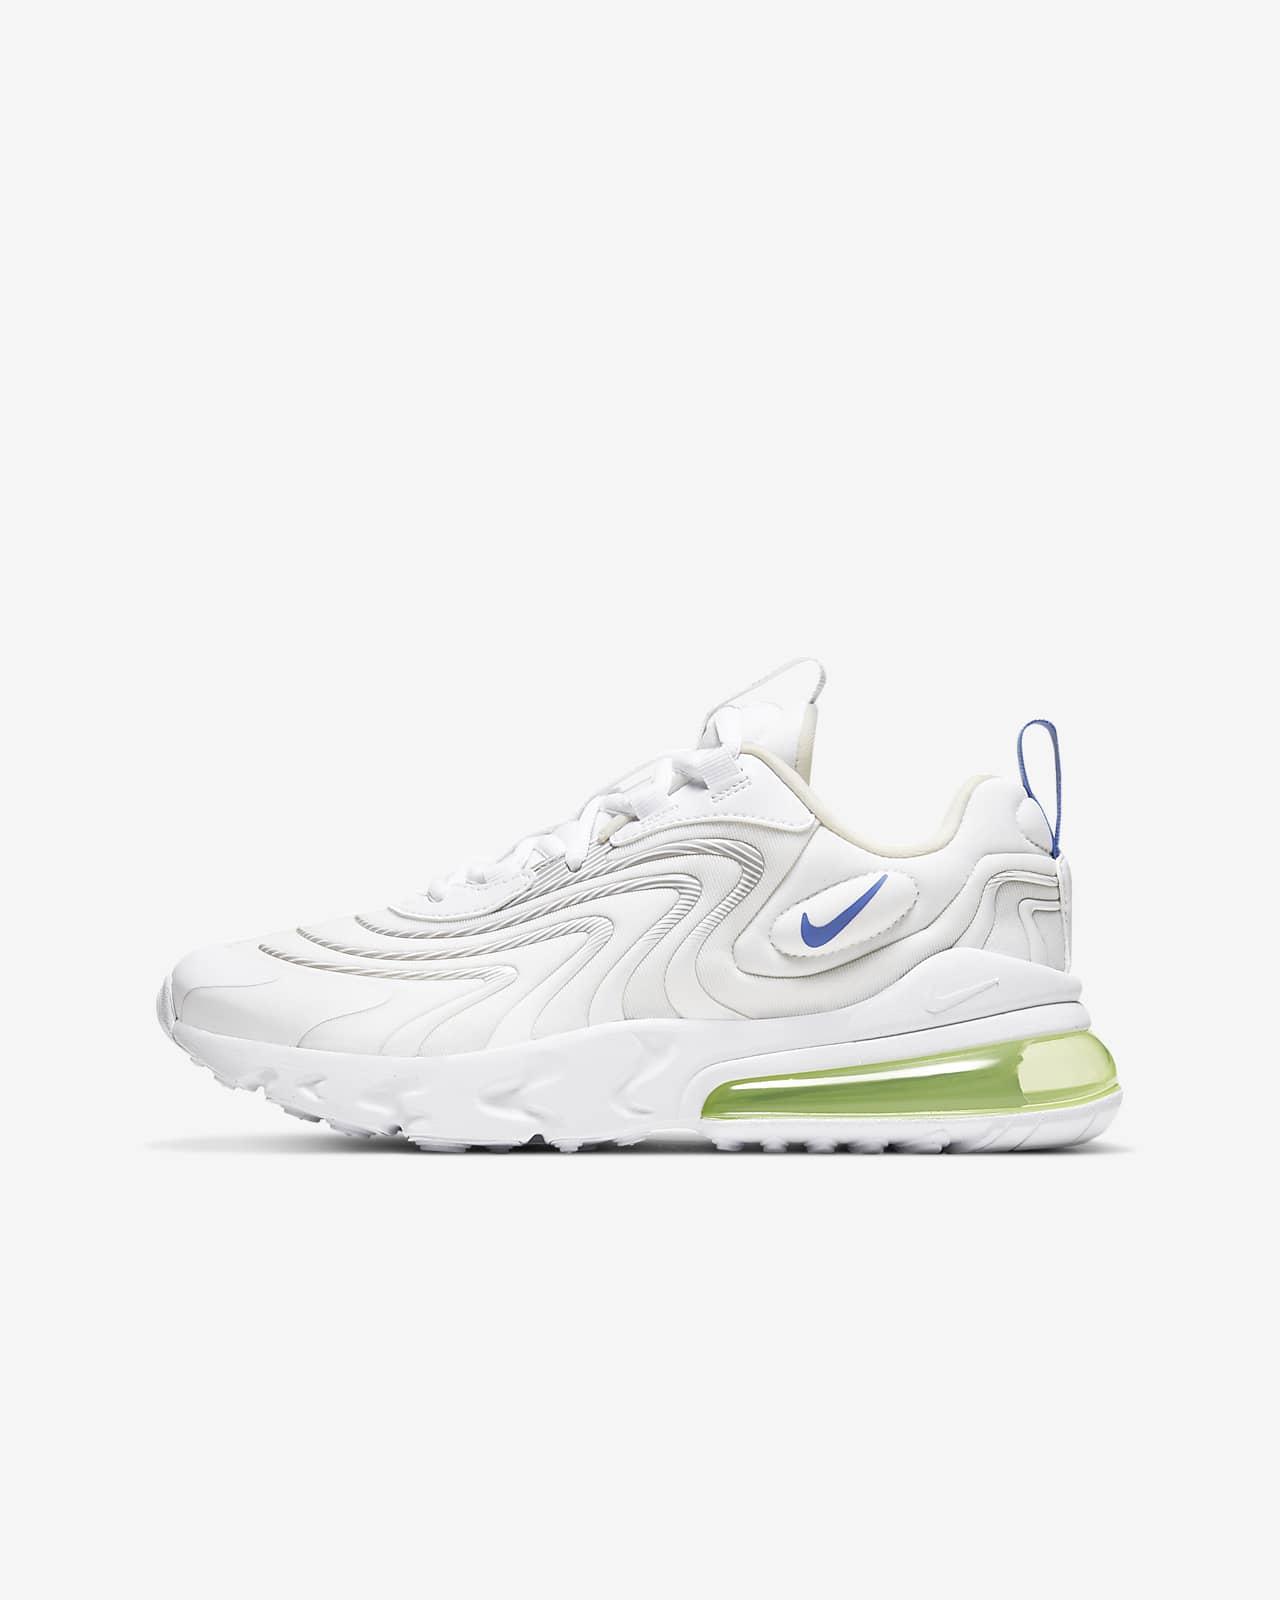 Nike Air Max 270 React ENG cipő nagyobb gyerekeknek